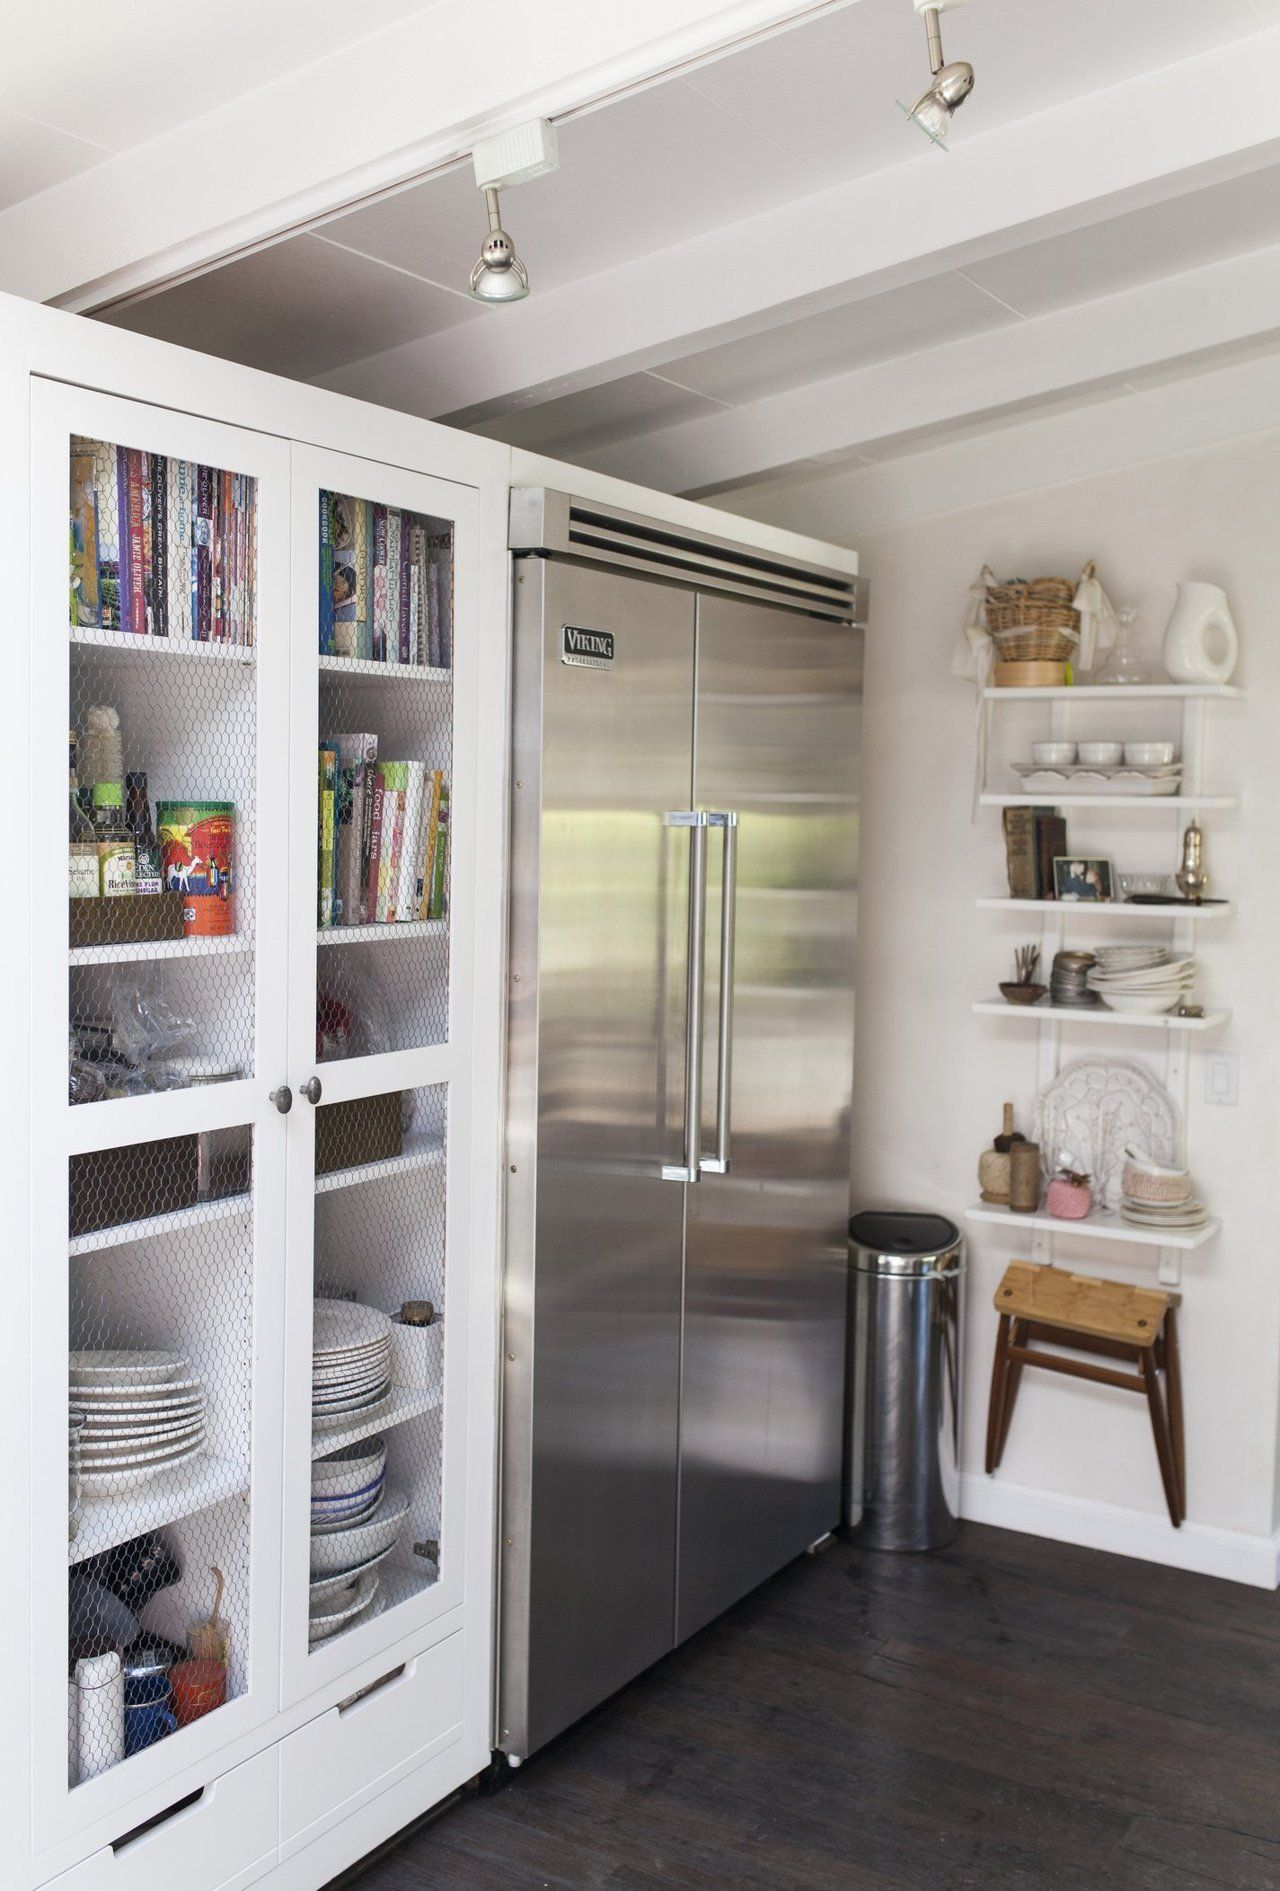 where we cook caroline jeffrey s elegant california kitchen pantry laundry room kitchen on kitchen organization elegant id=44710